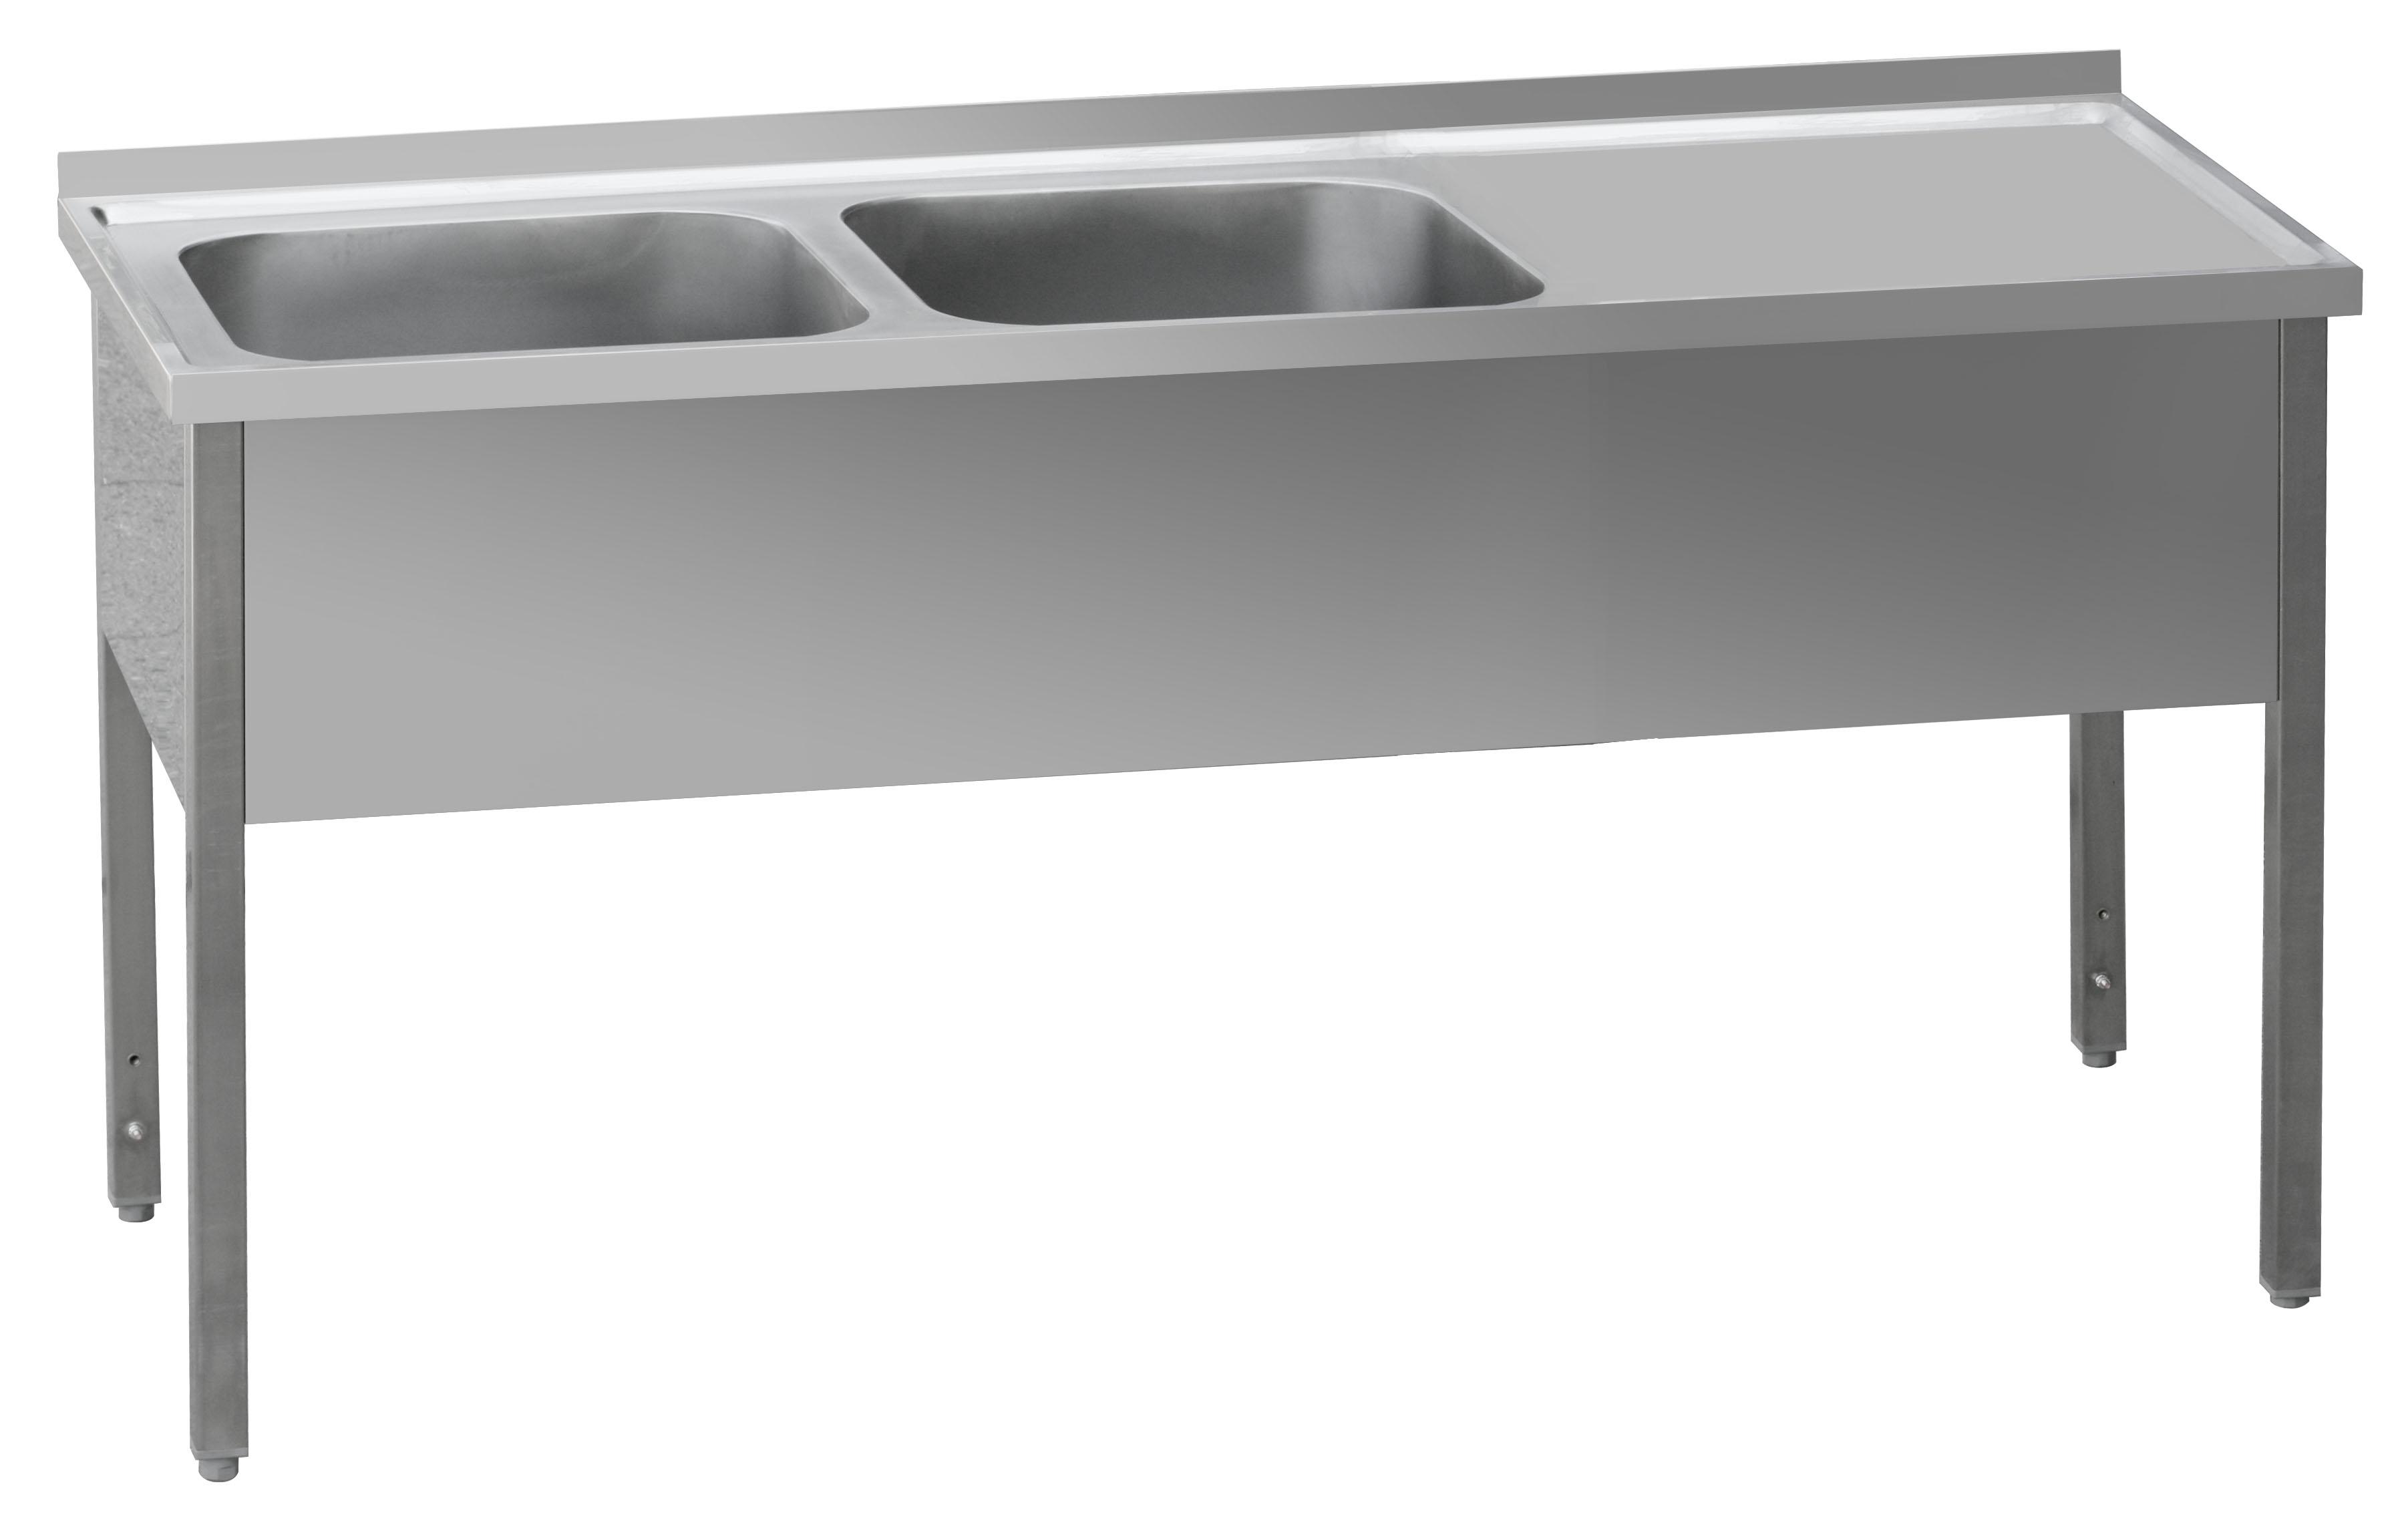 Stůl mycí dvoudřez MSDOP 140x70x90 REDFOX